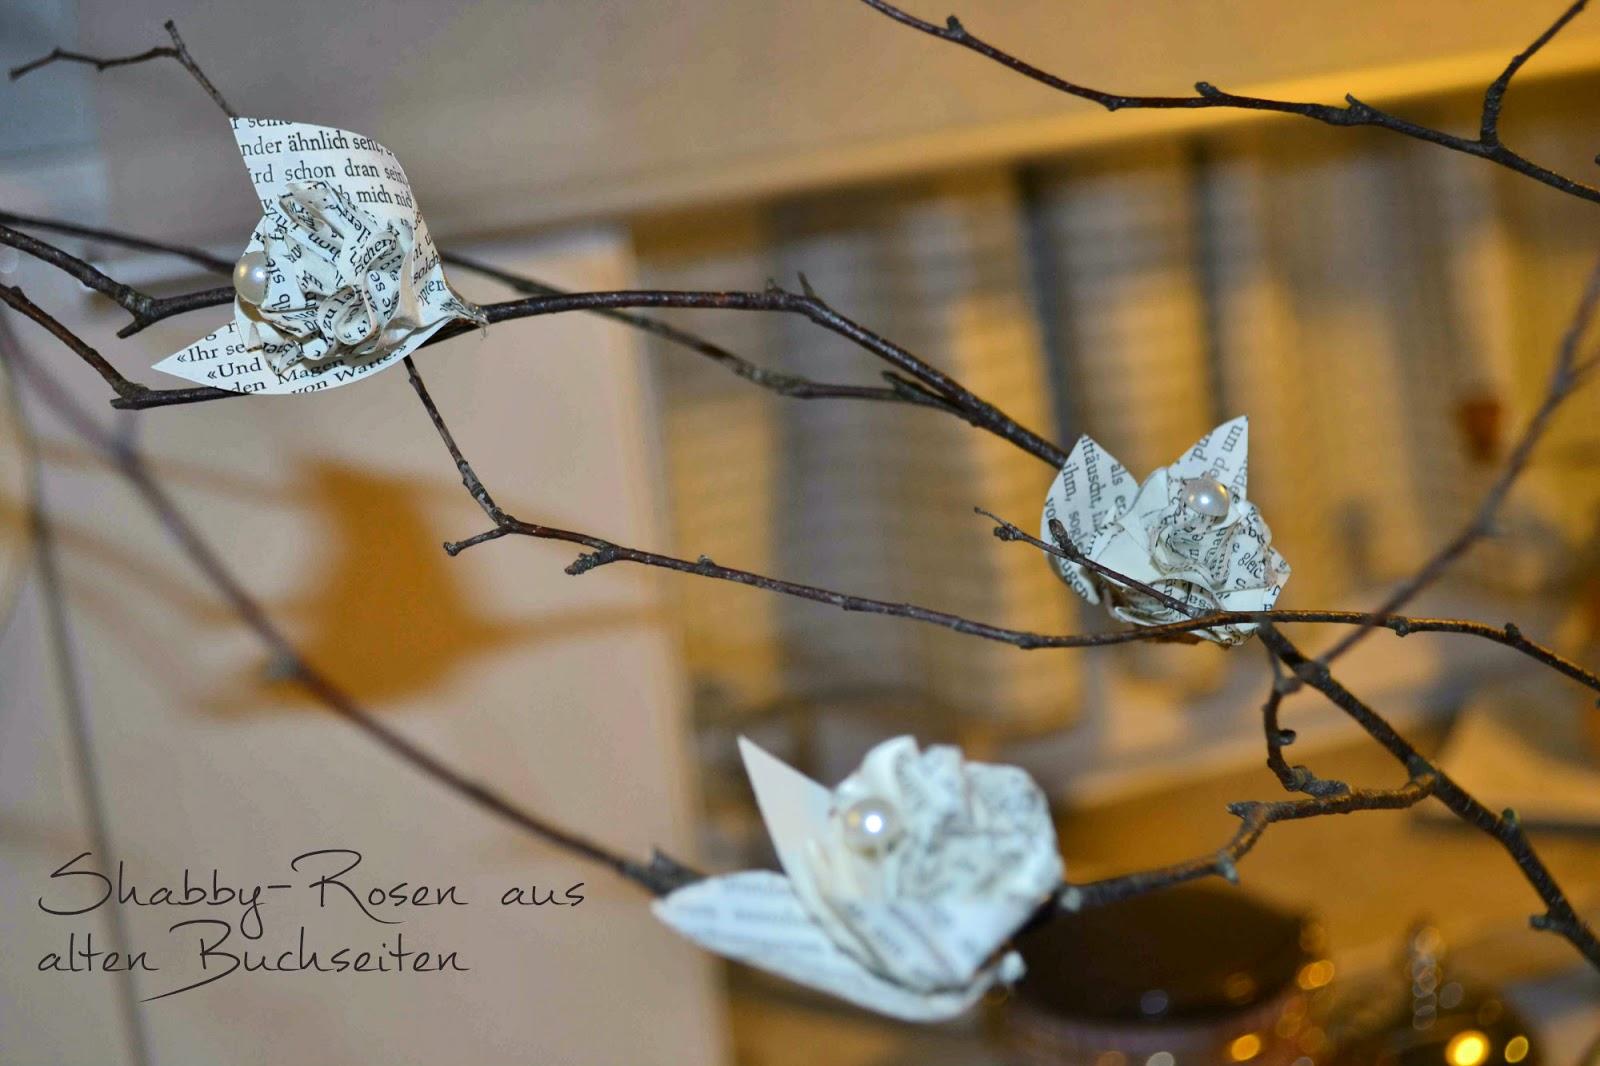 petra 39 s nest diy rosen aus alten b chern. Black Bedroom Furniture Sets. Home Design Ideas